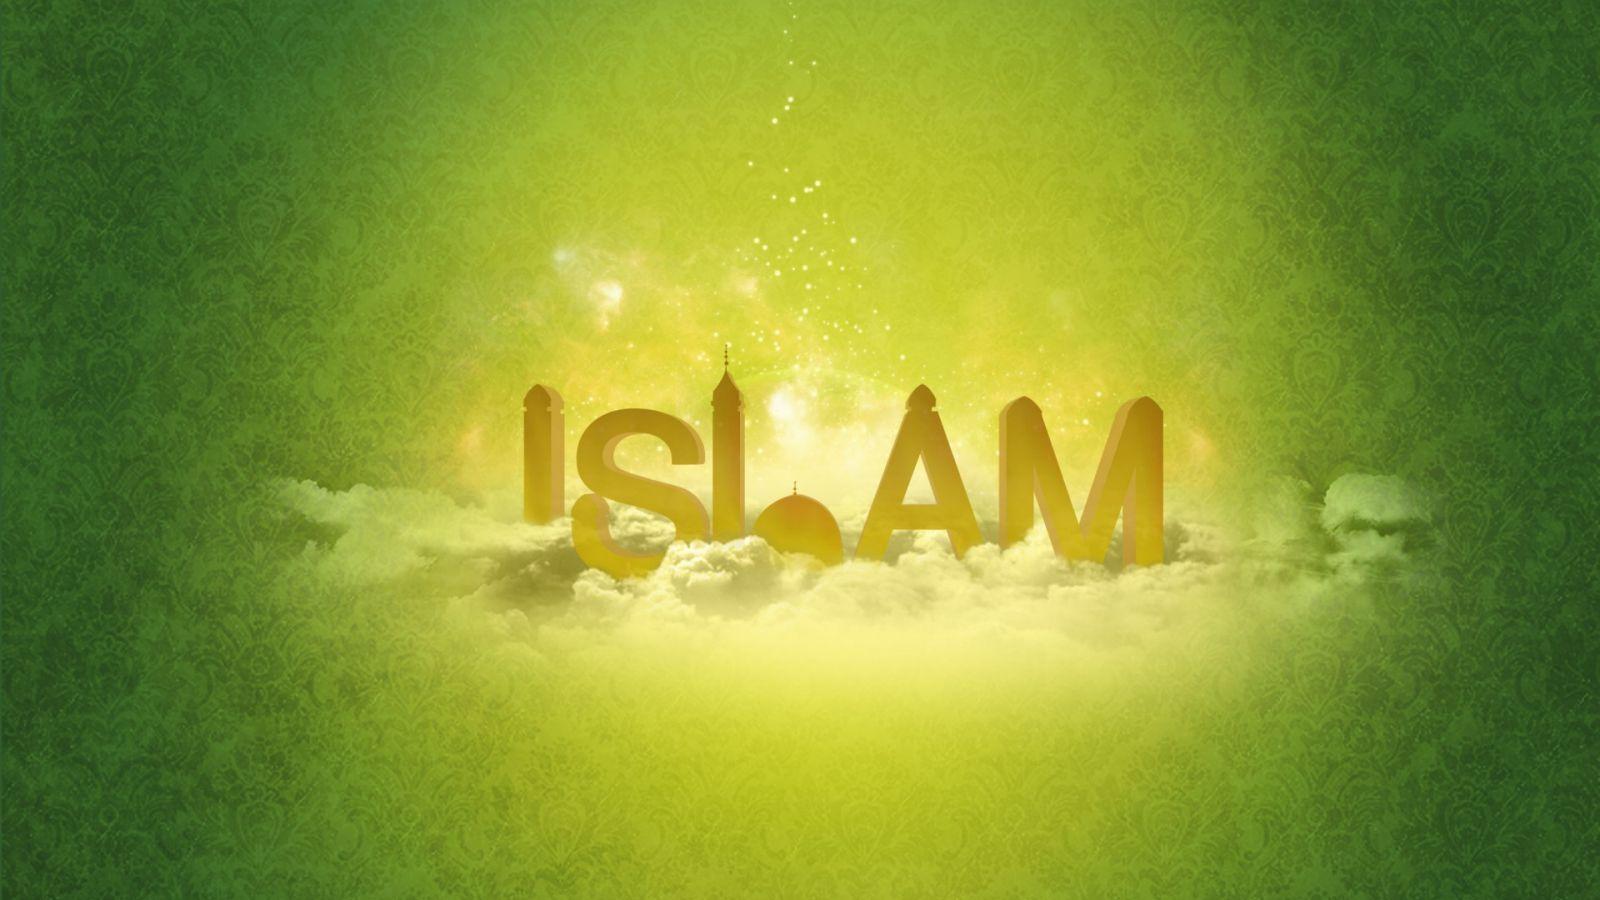 Don't Panic I'm Islamic!: Introduction to Islam